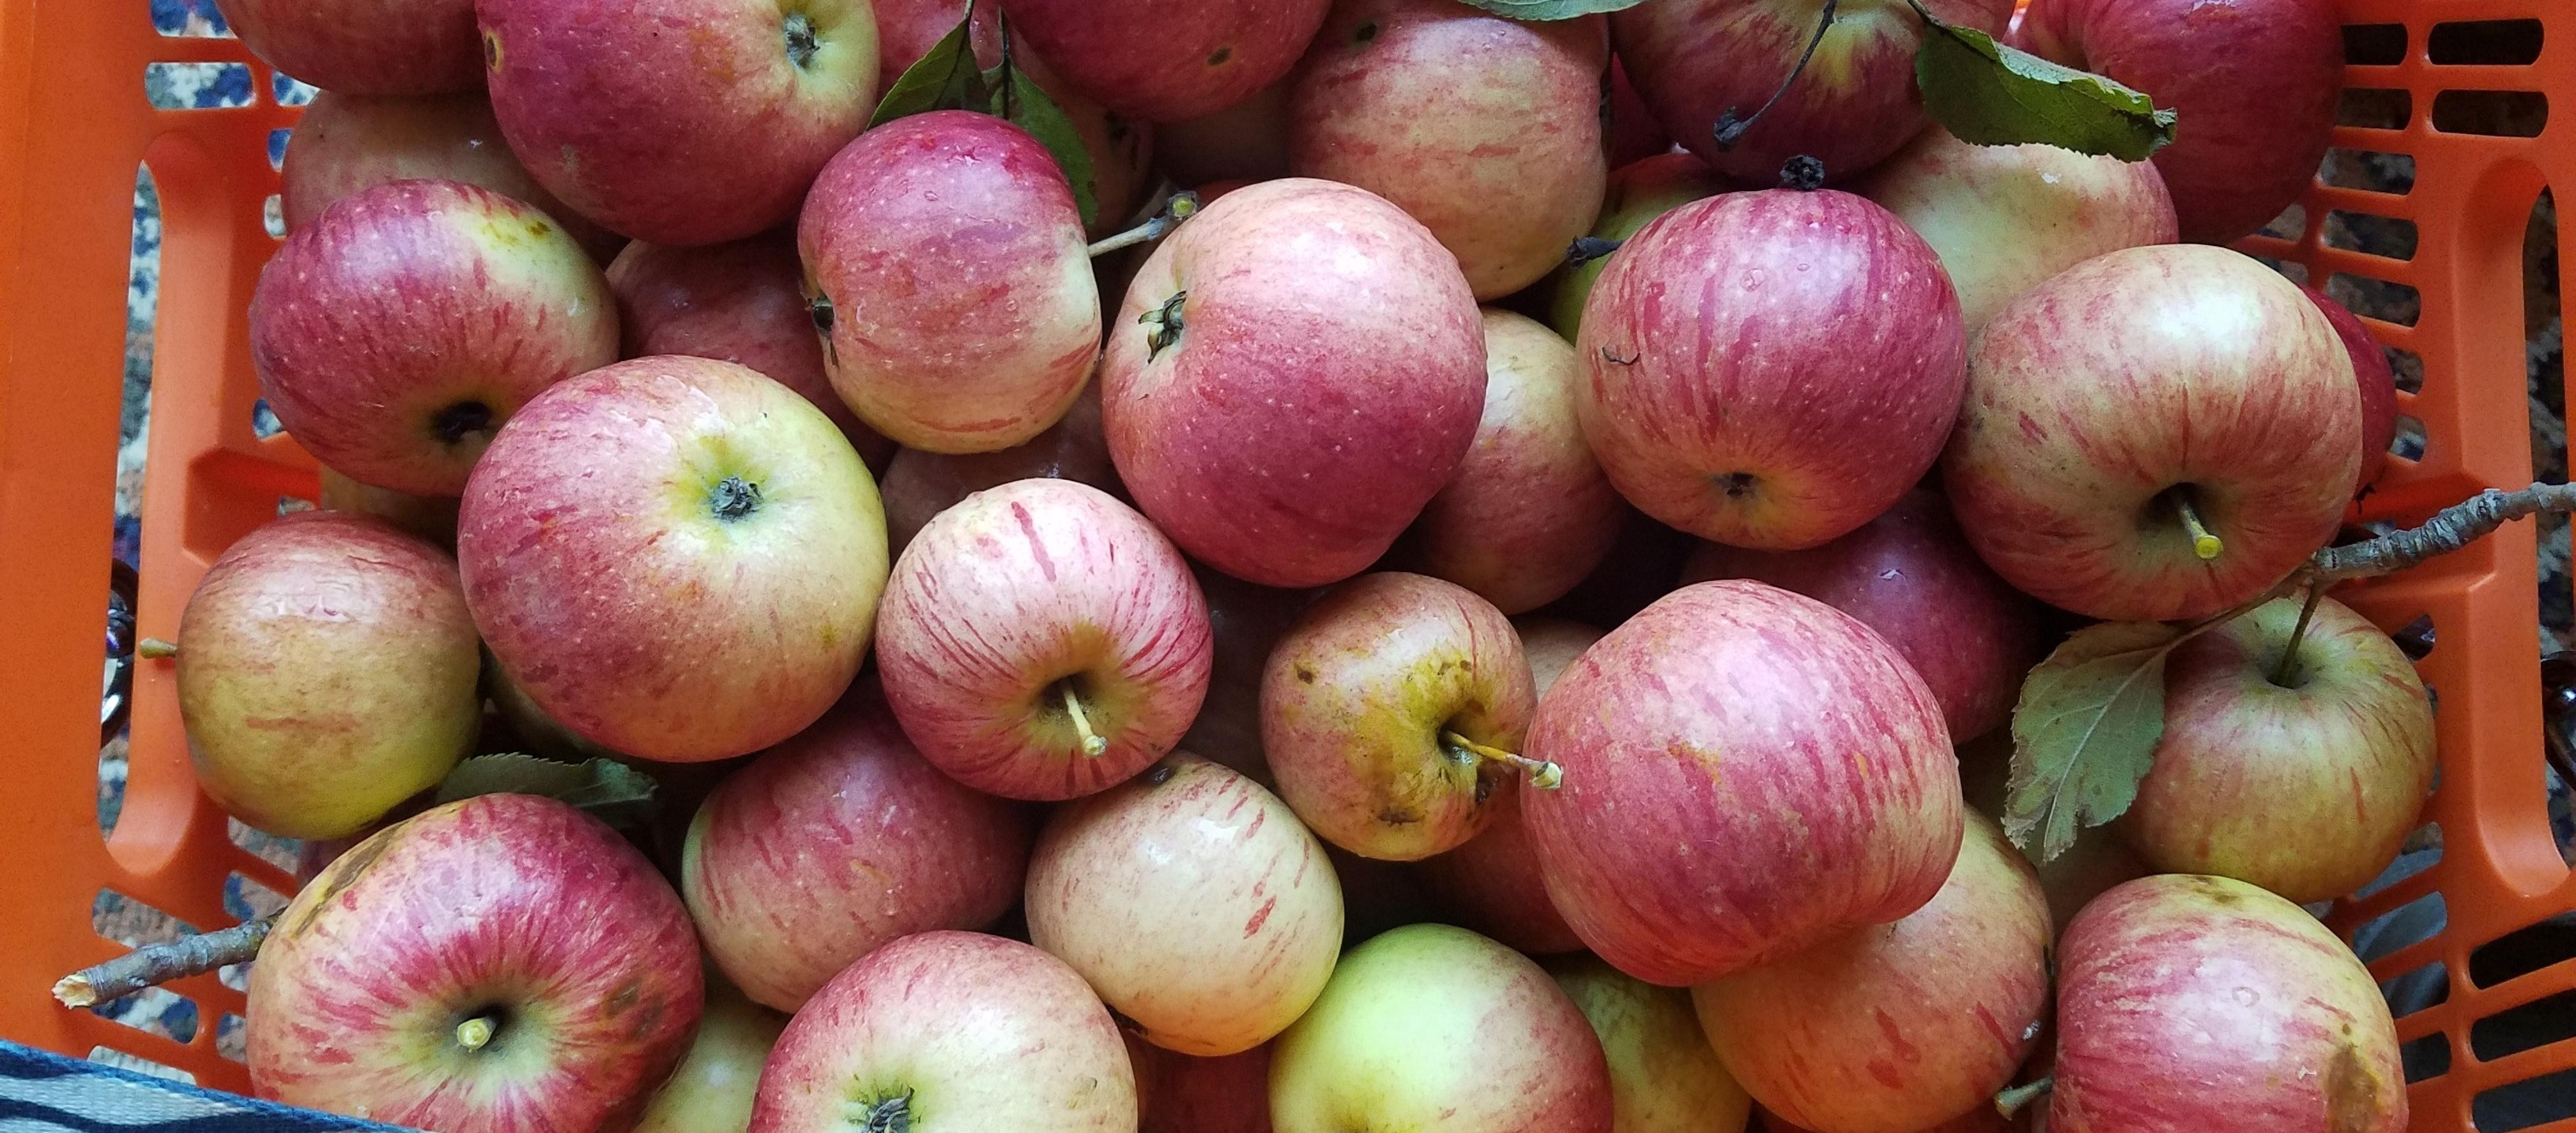 2019 apples